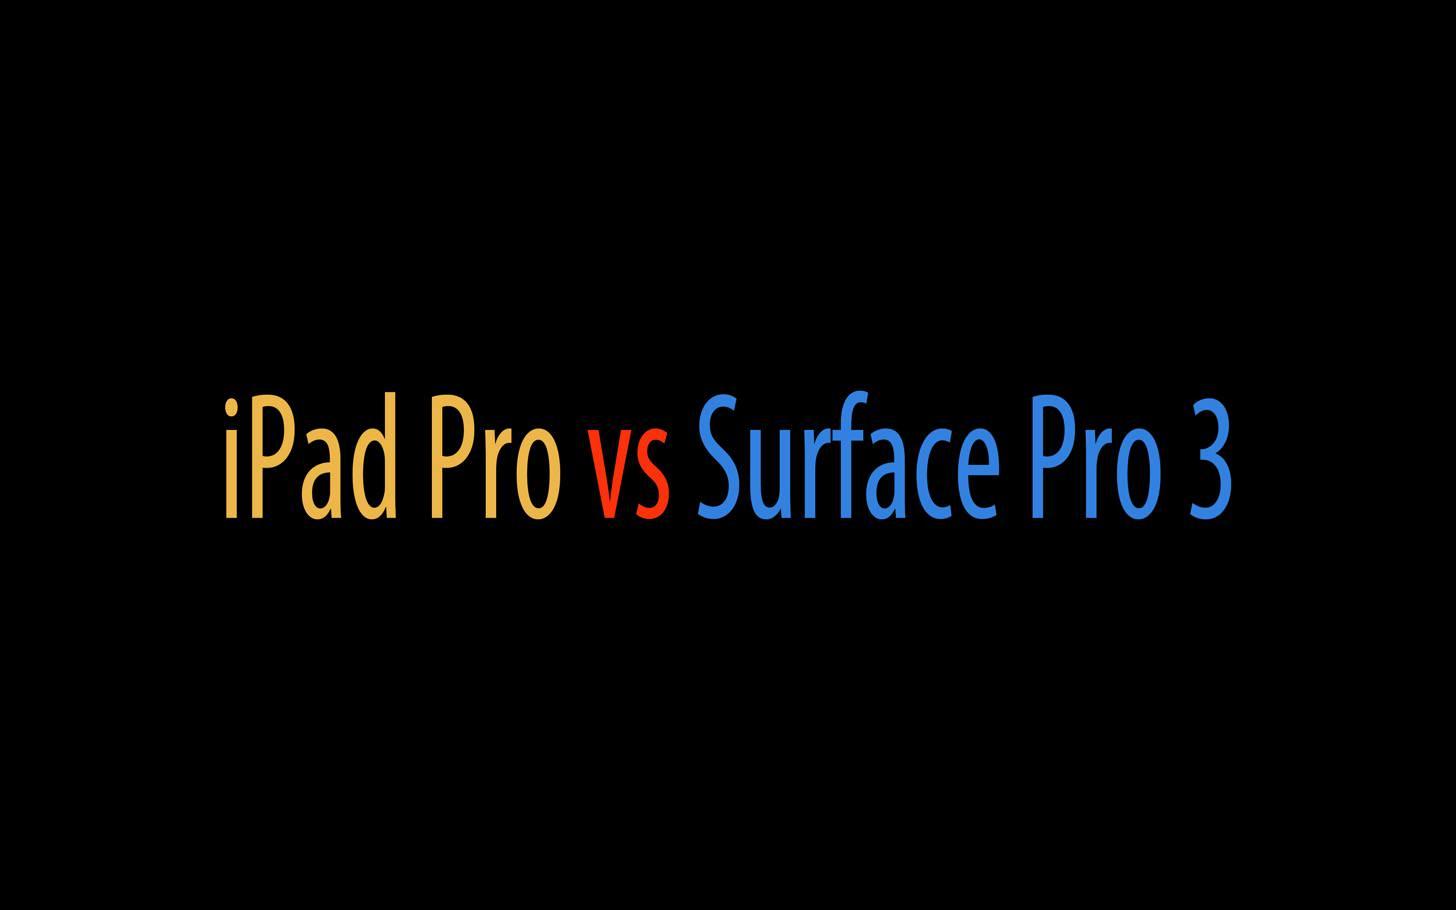 IPad Pro vs Surface Pro 3